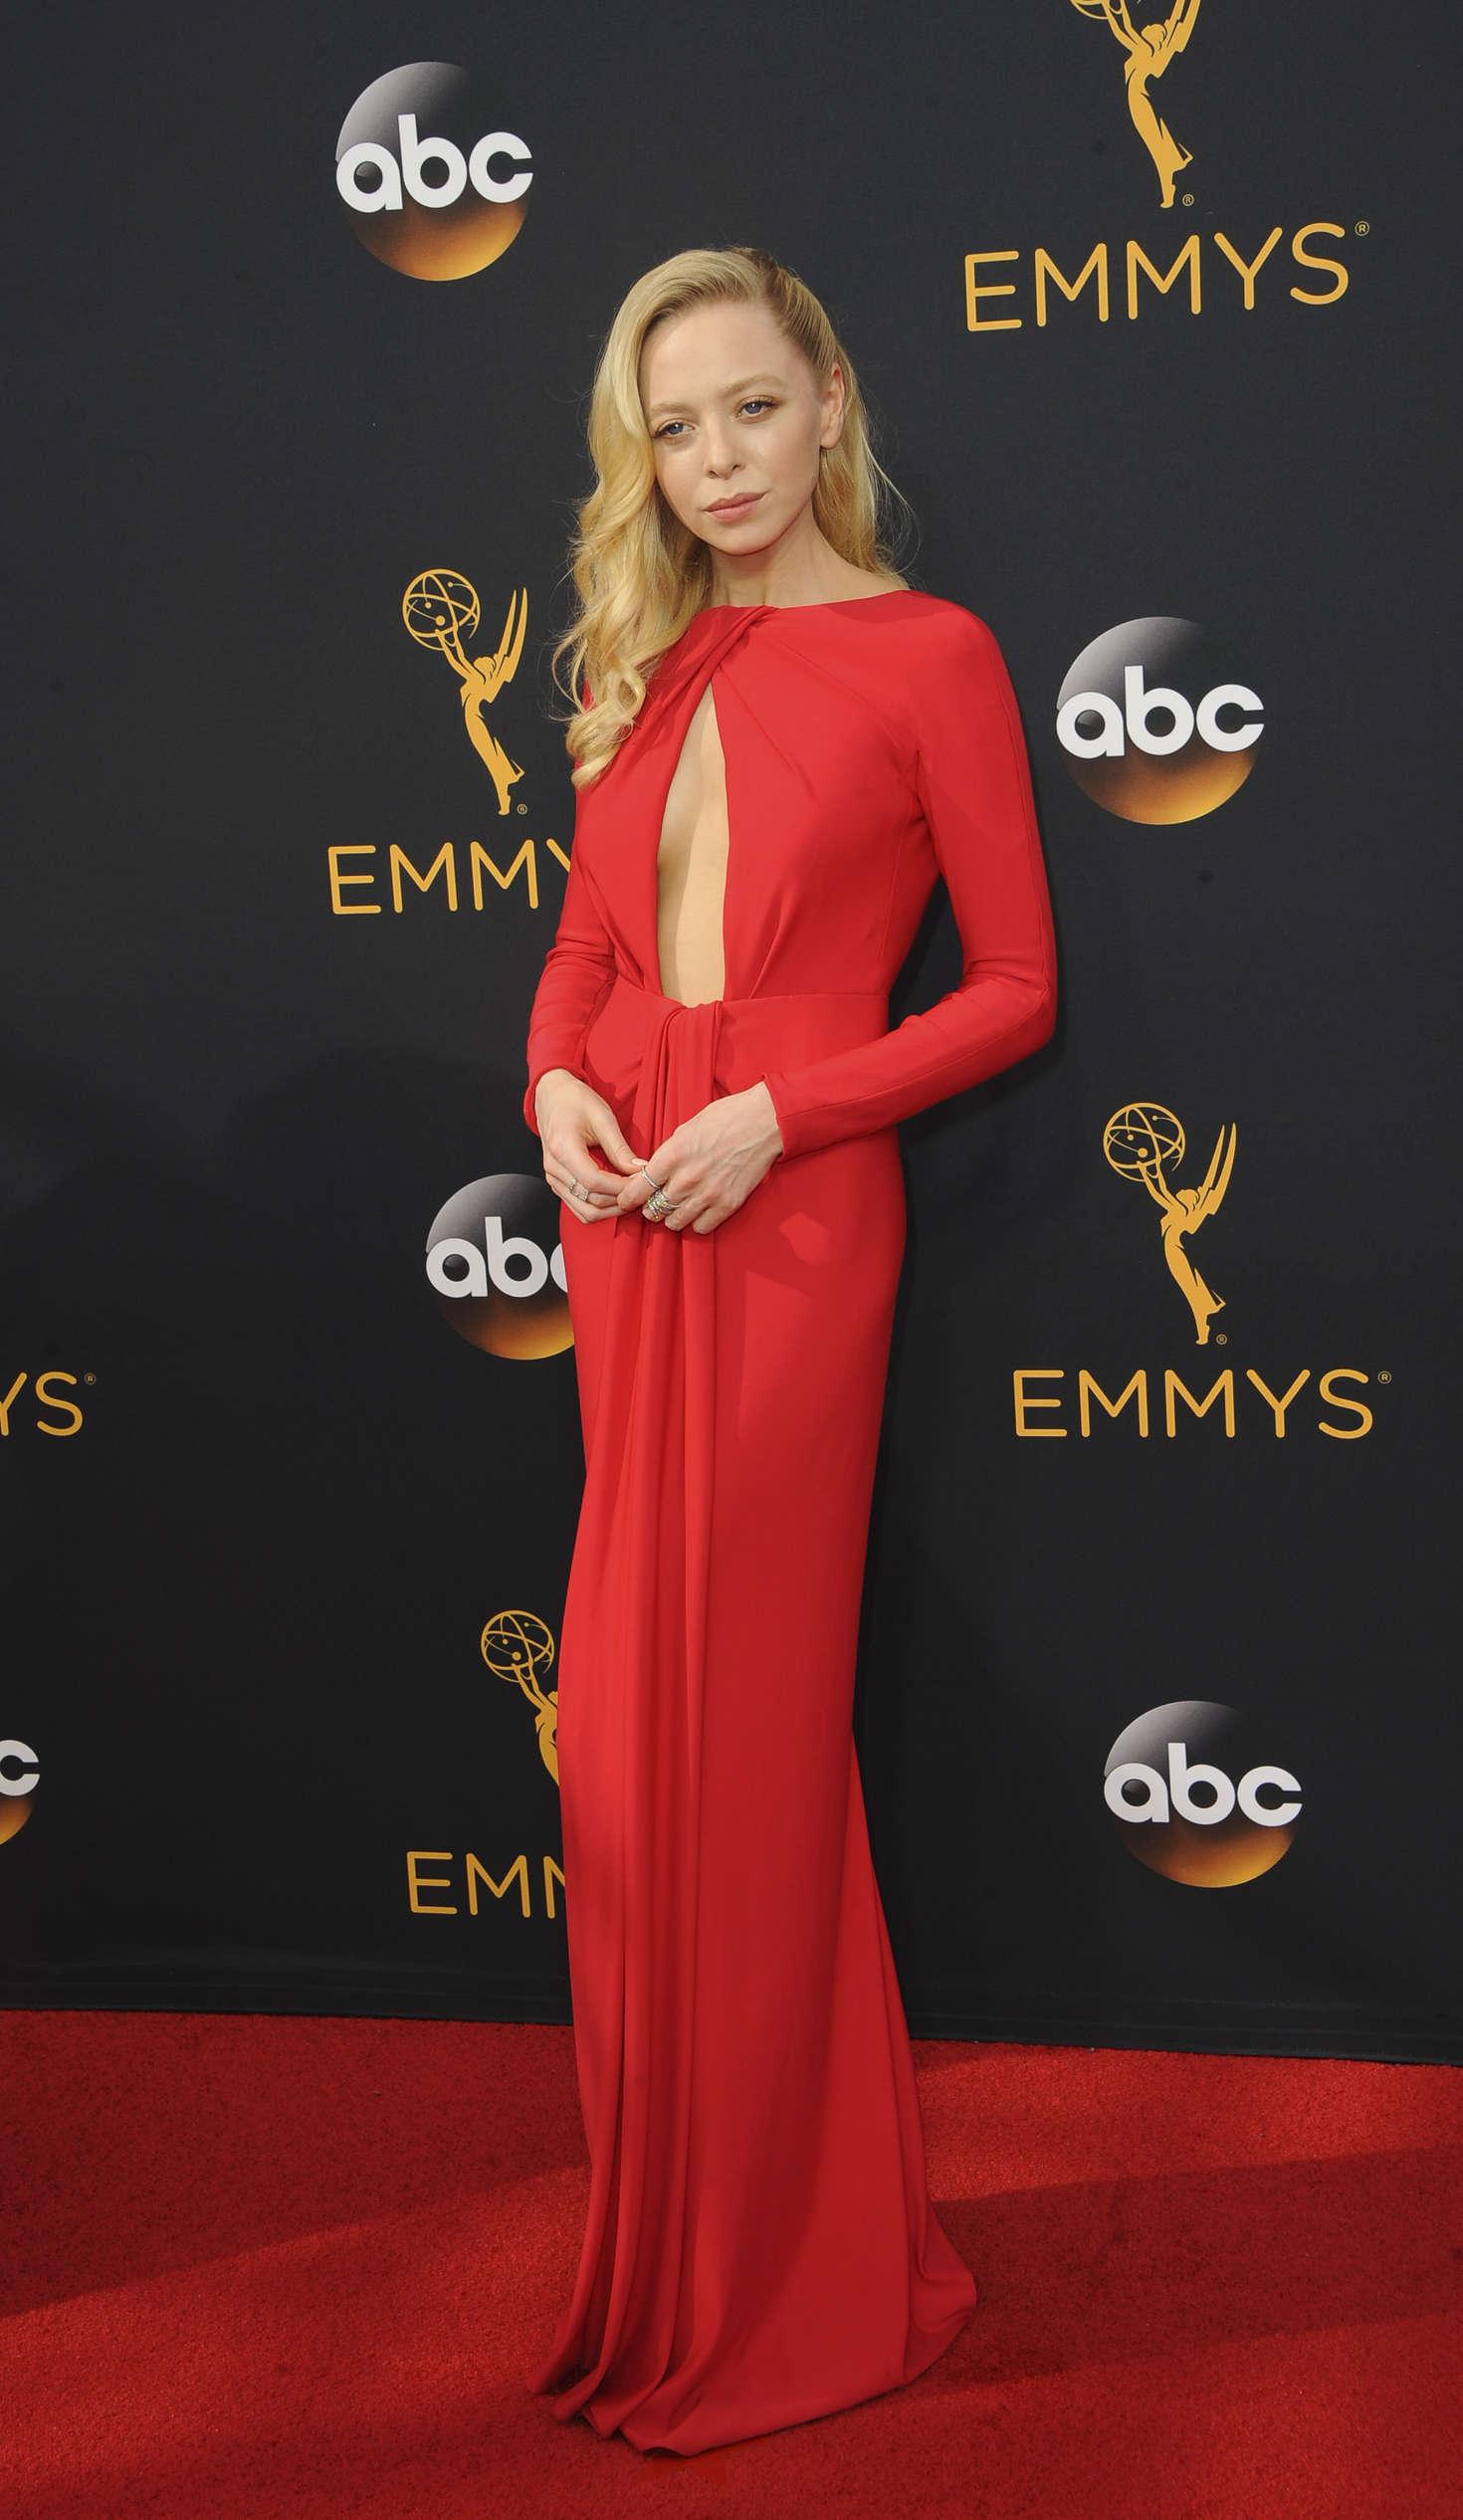 Portia Doubleday 2016 : Portia Doubleday: 2016 Emmy Awards -01